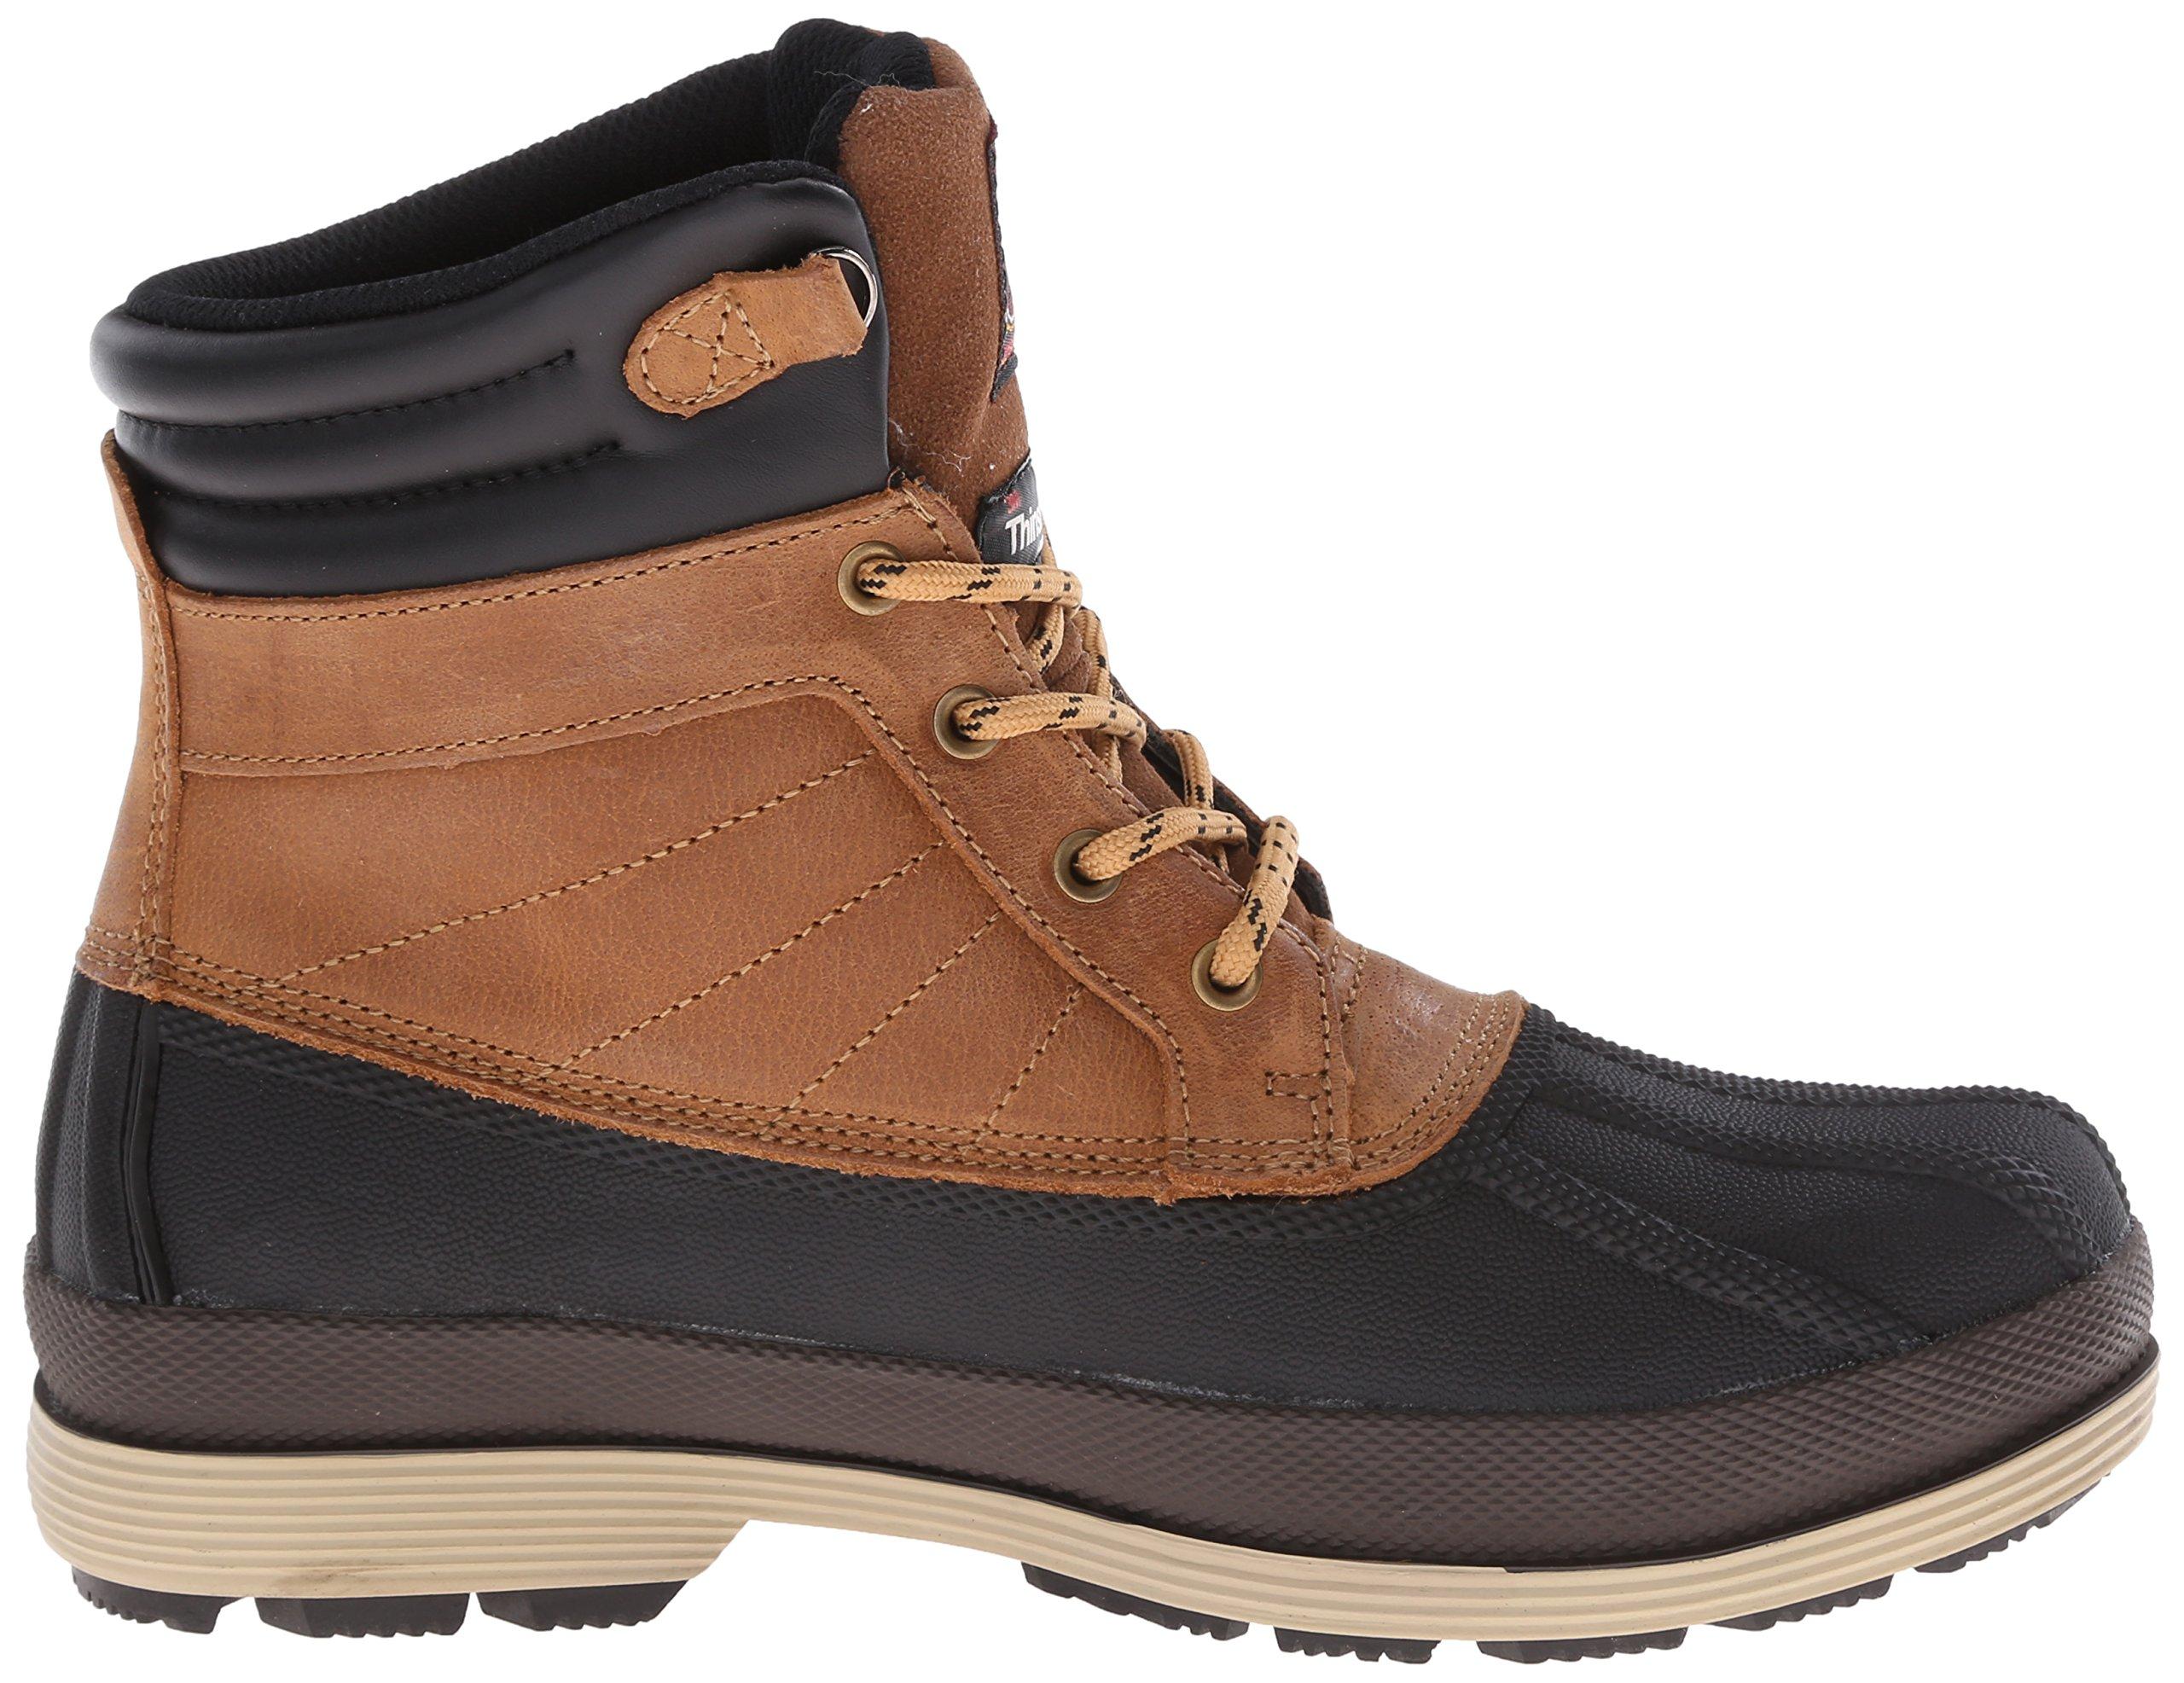 Skechers for Work Women's Duck Rain Boot, Brown, 5.5 M US by Skechers (Image #7)